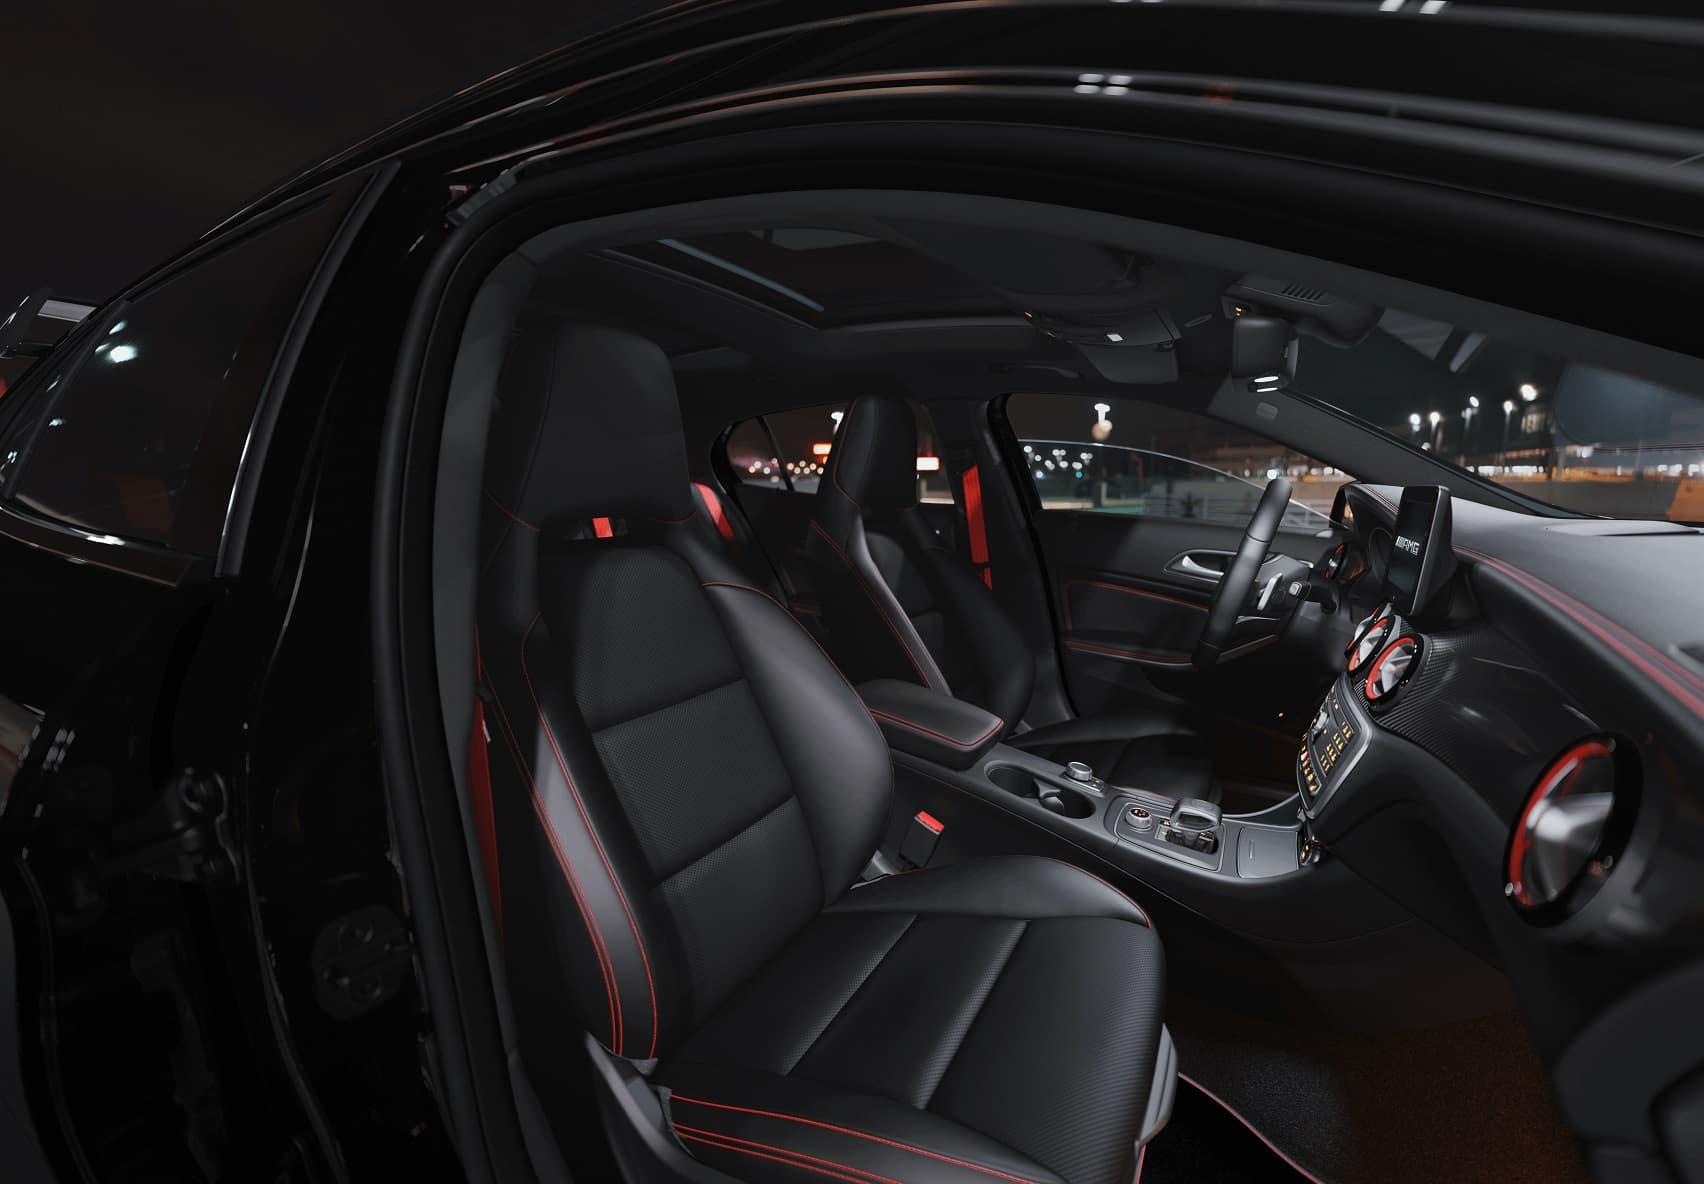 Mercedes-Benz GLA Interior Space